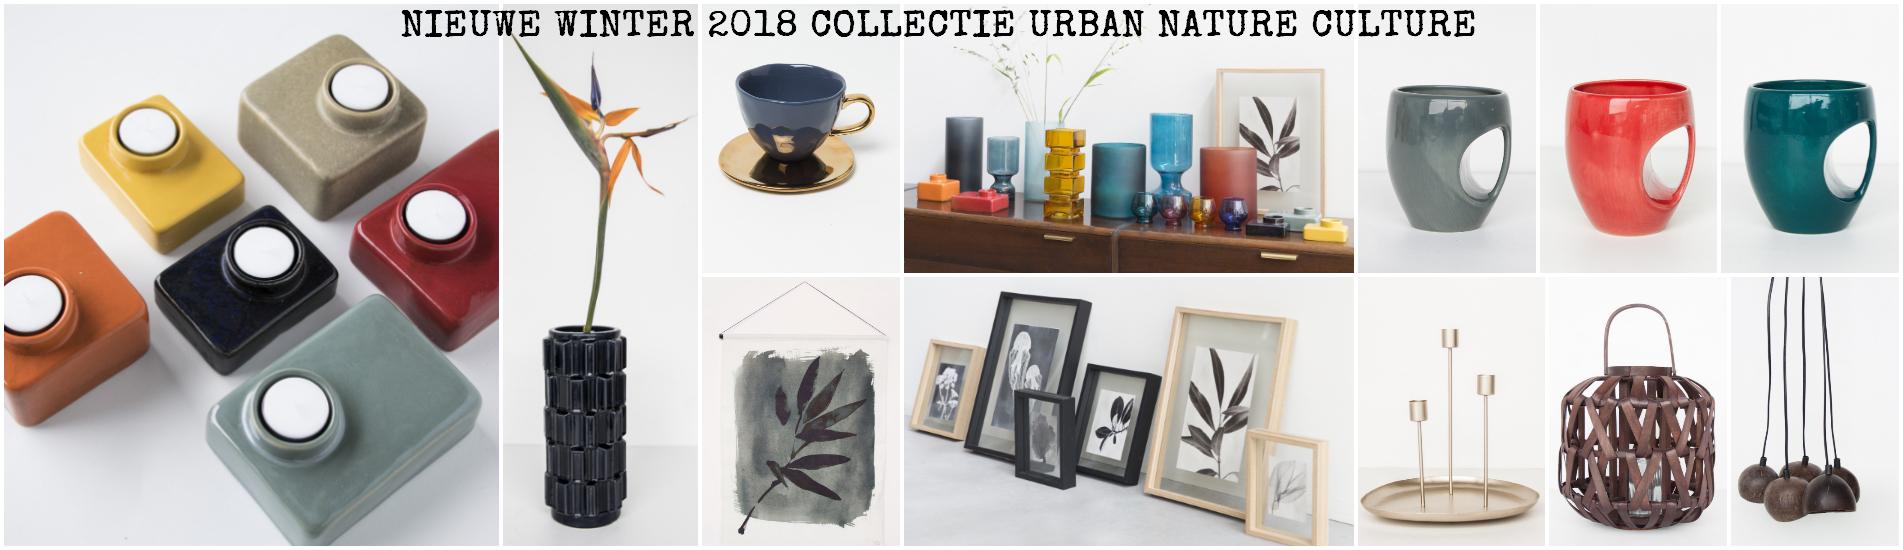 Banner-urban-nature-culture